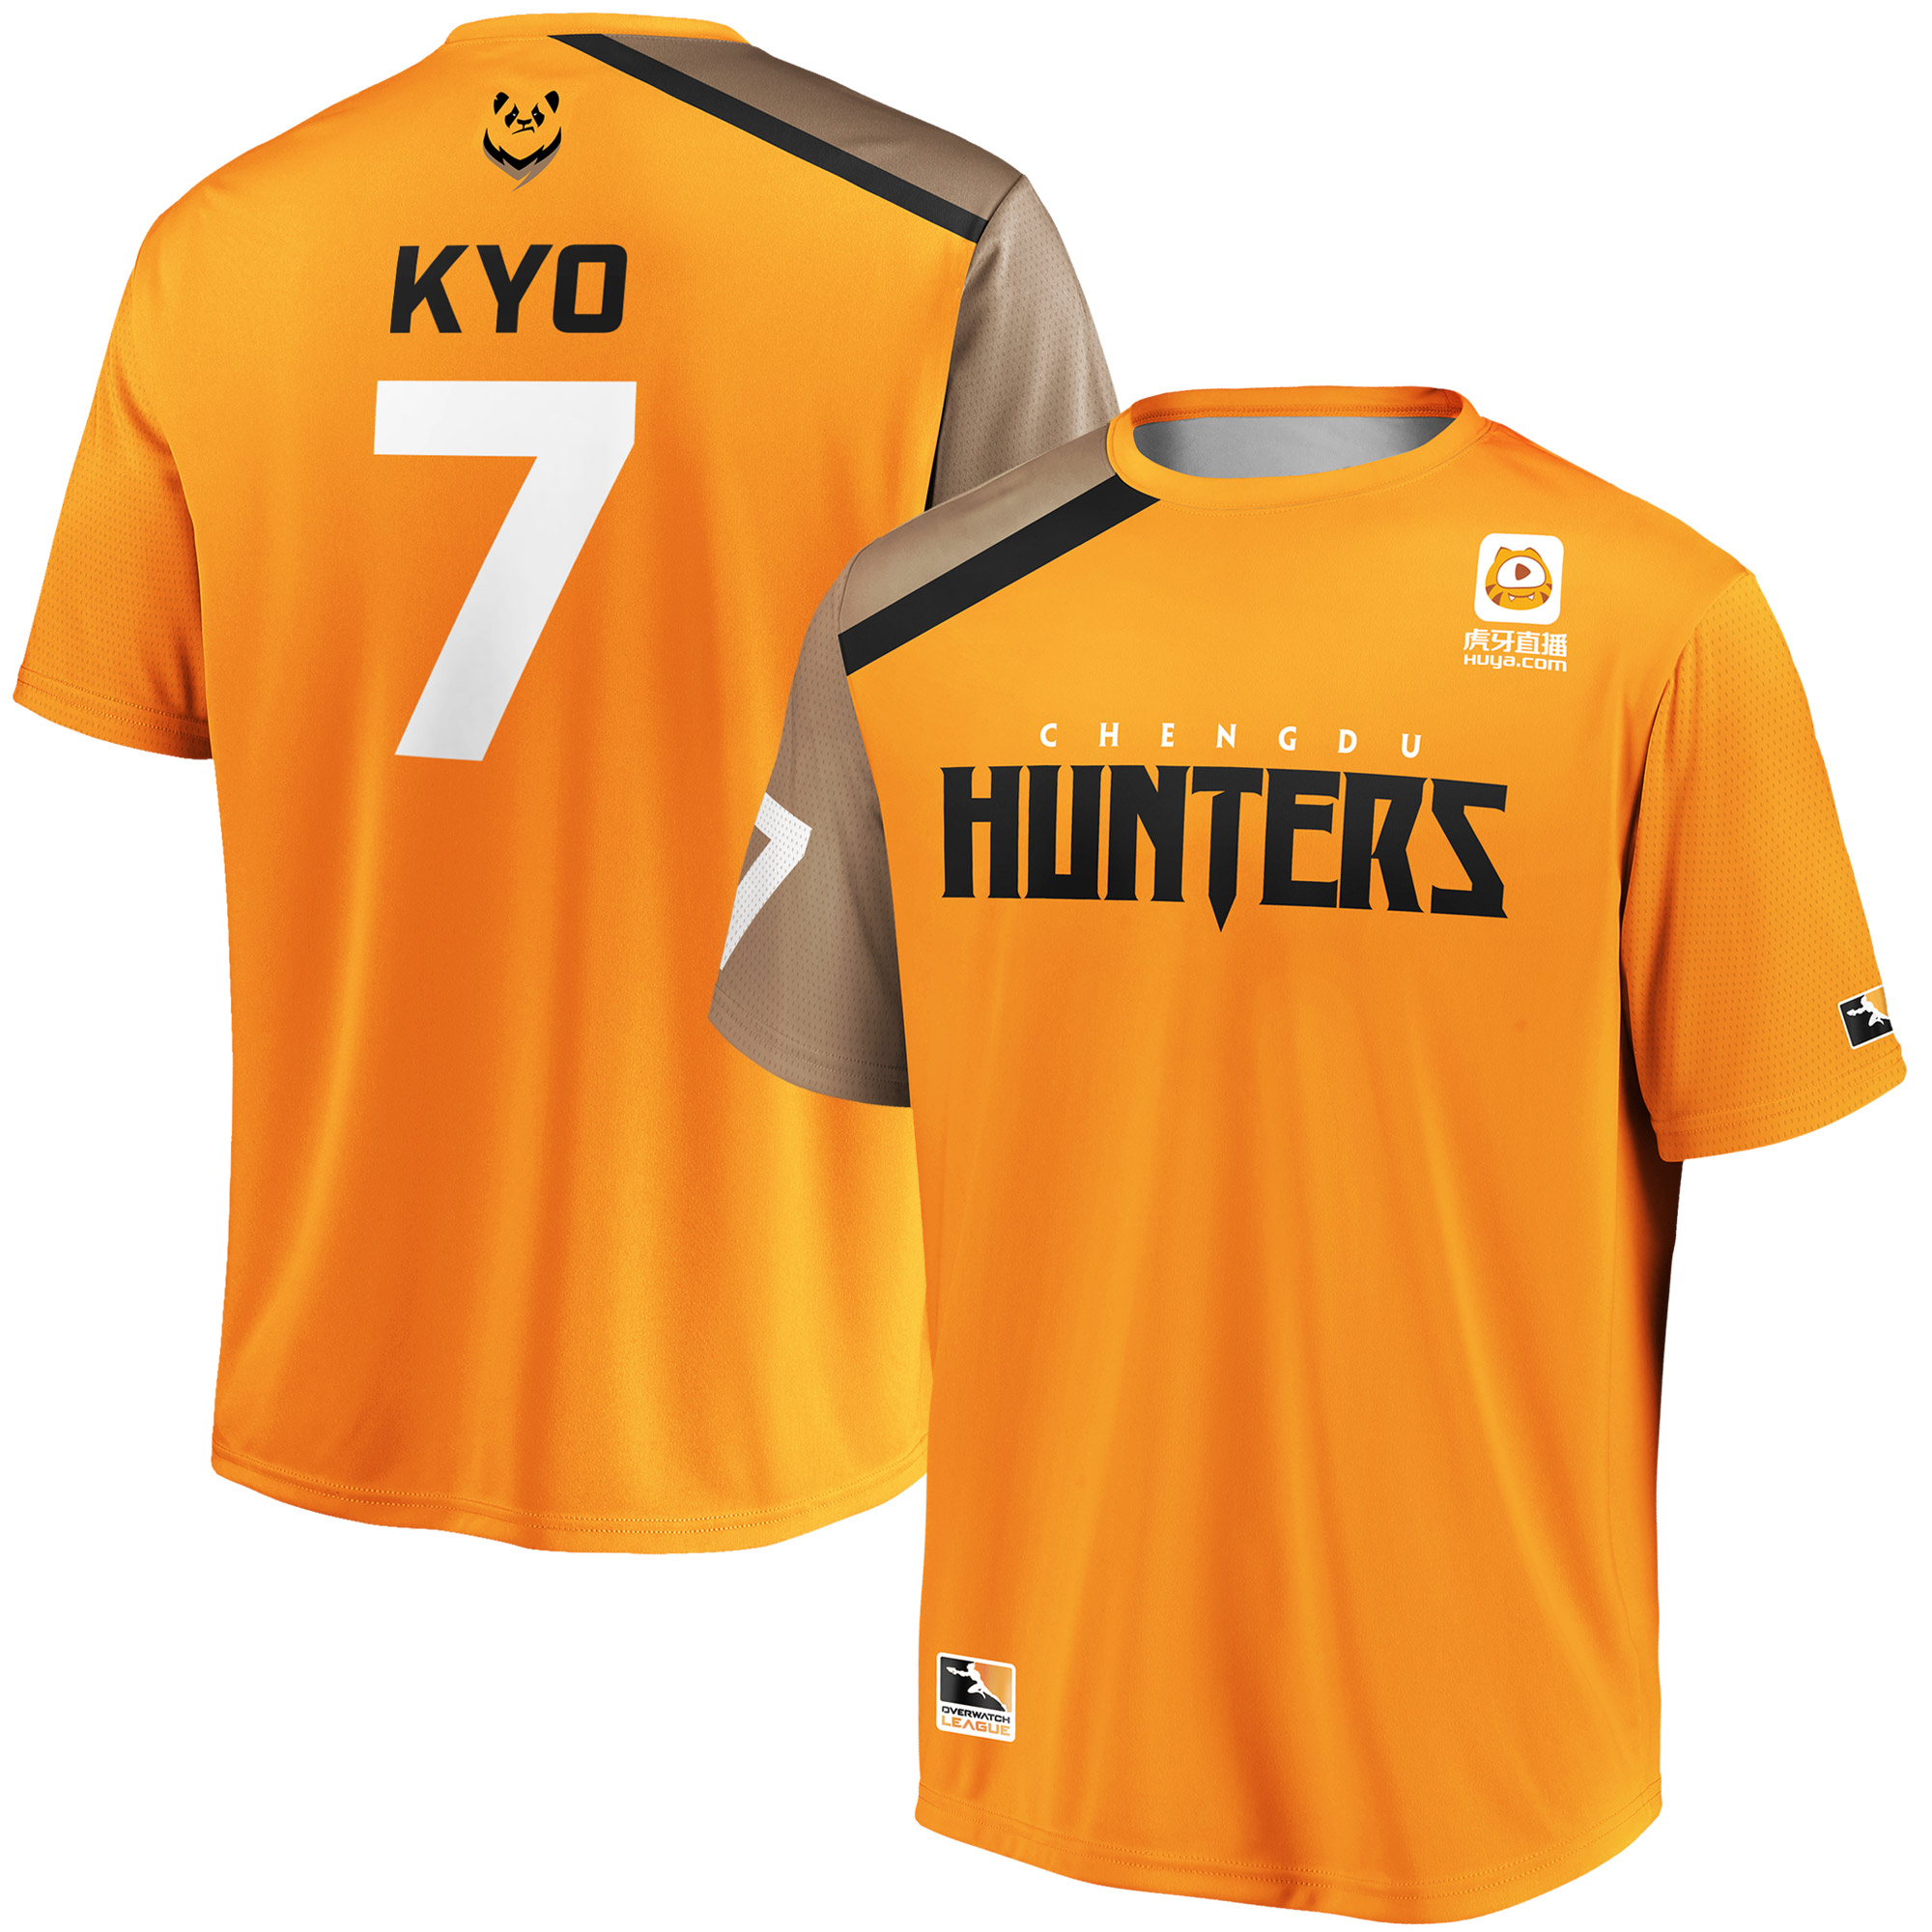 Kyo Chengdu Hunters Overwatch League Replica Home Jersey - Orange